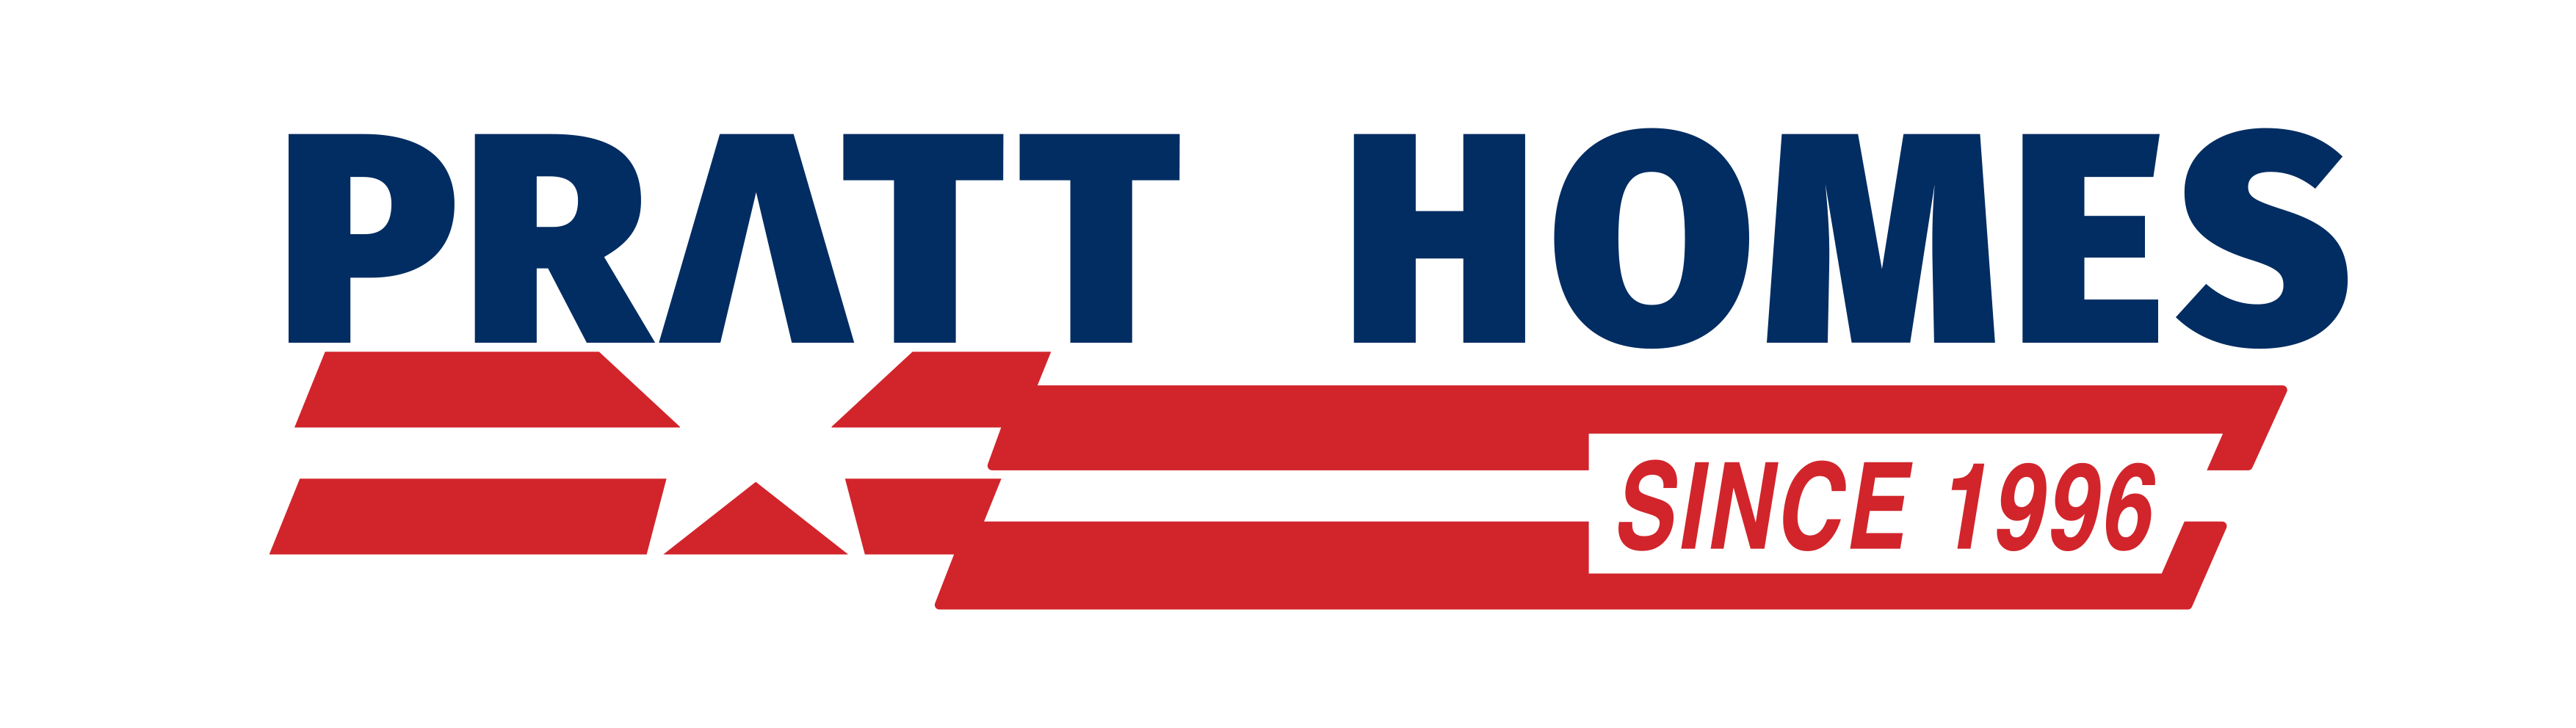 Pratt homes chattanooga floor plans